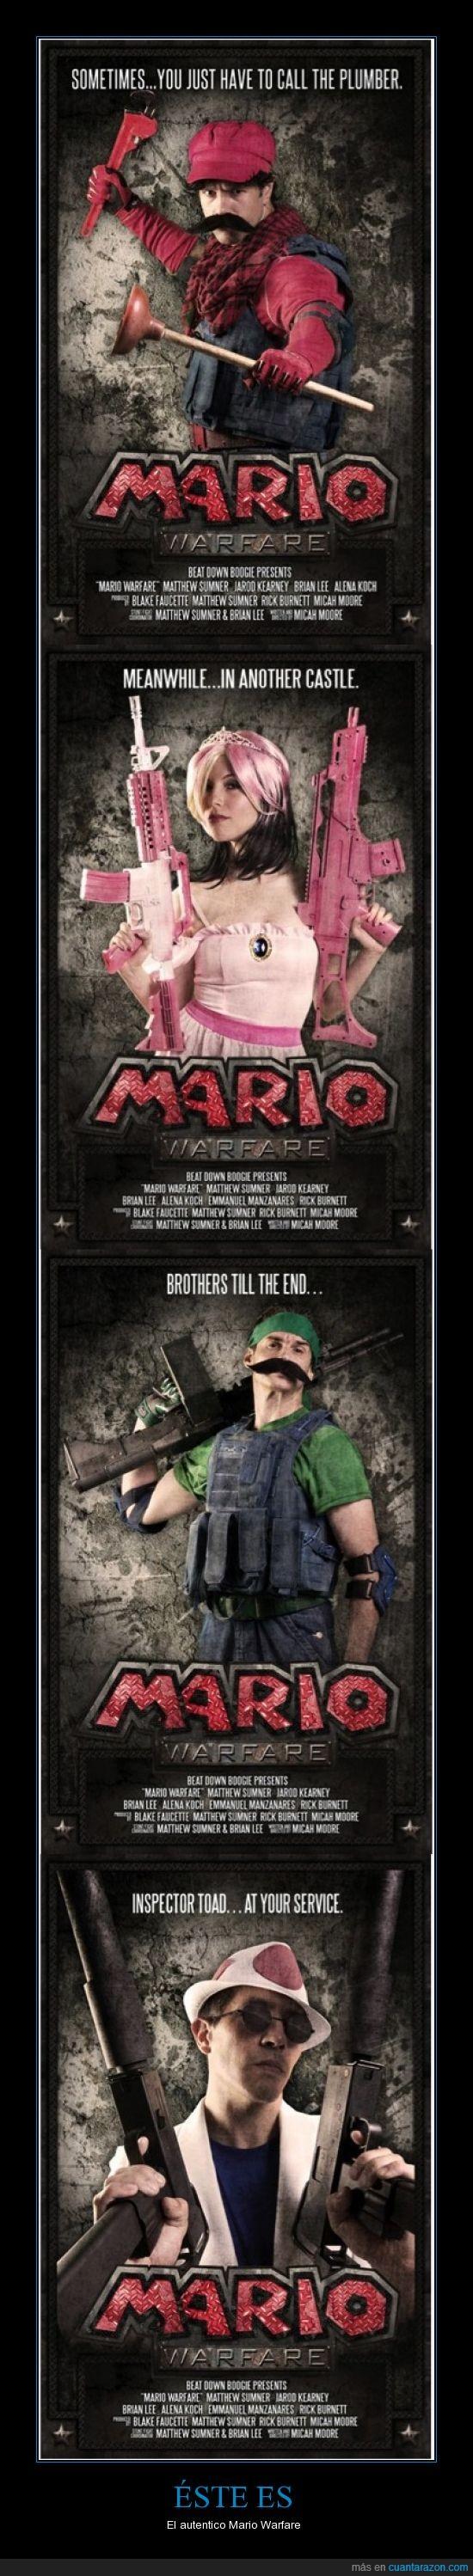 Luigi,Mario,Modern Warfare,Princesa Peach,Toadstool,Youtube